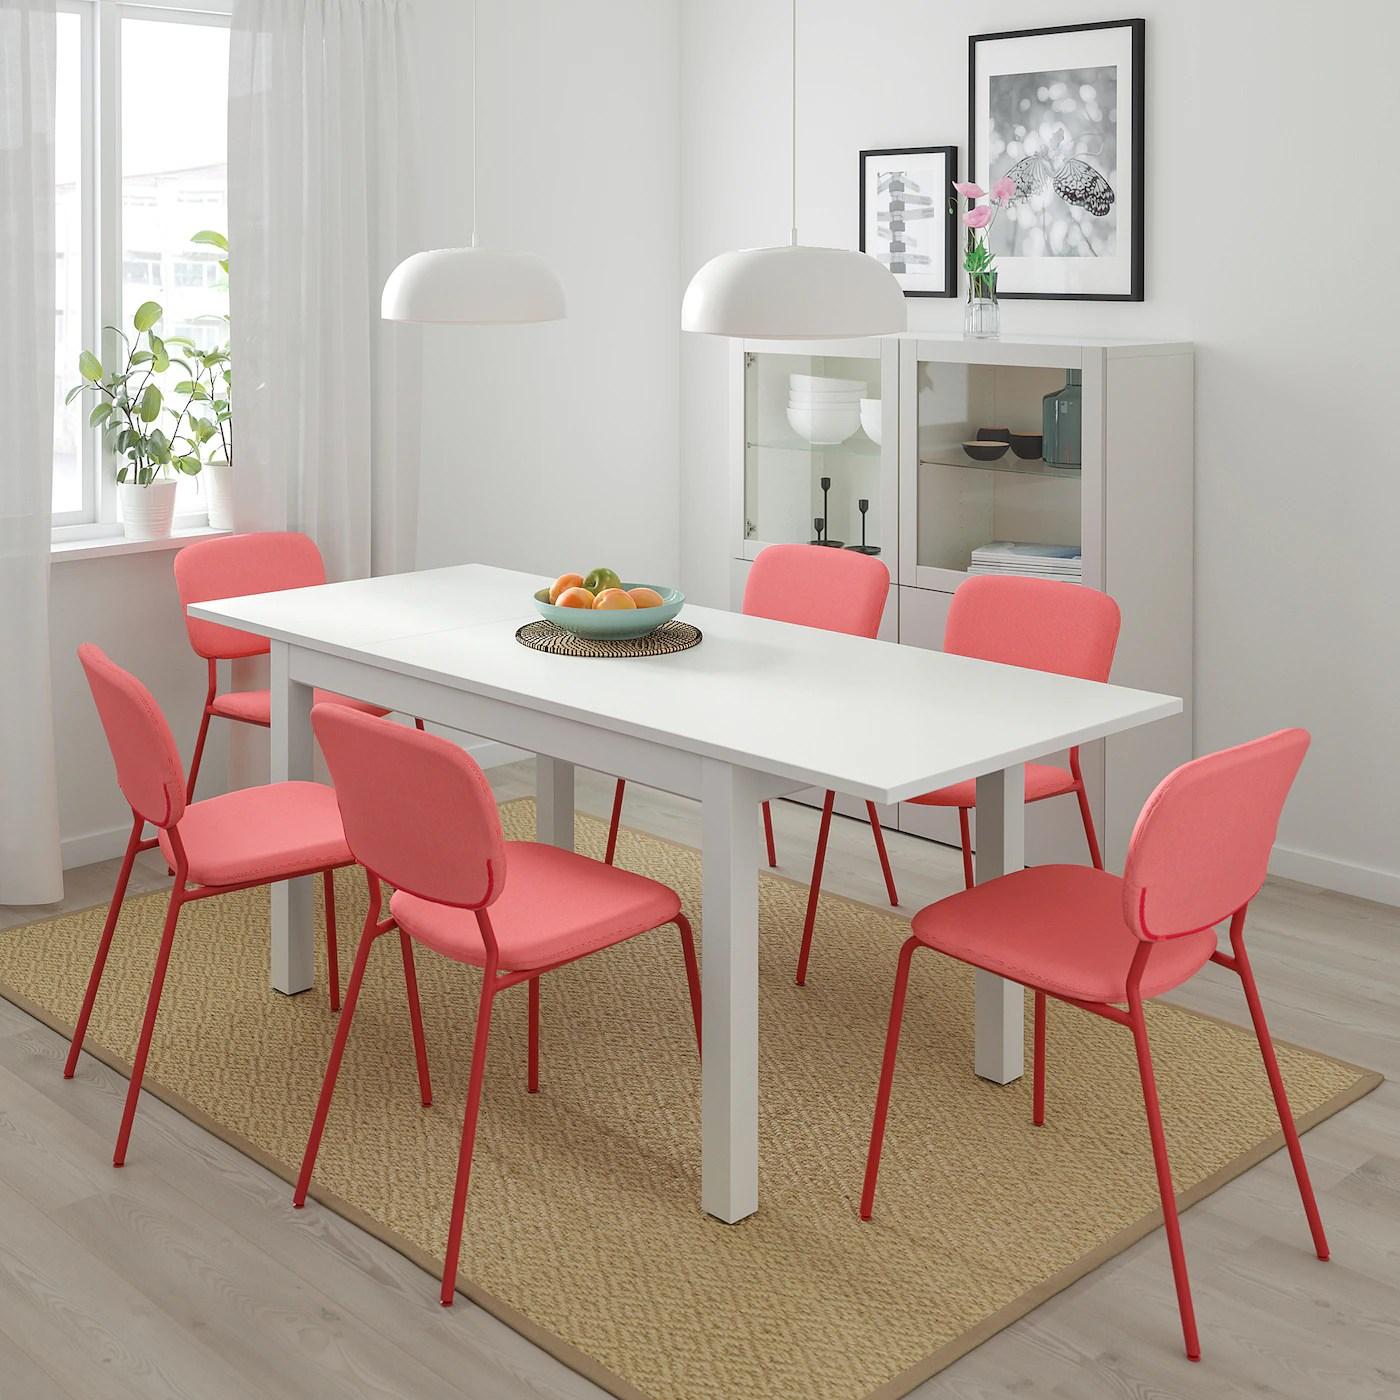 laneberg extendable table white 130 190x80 cm